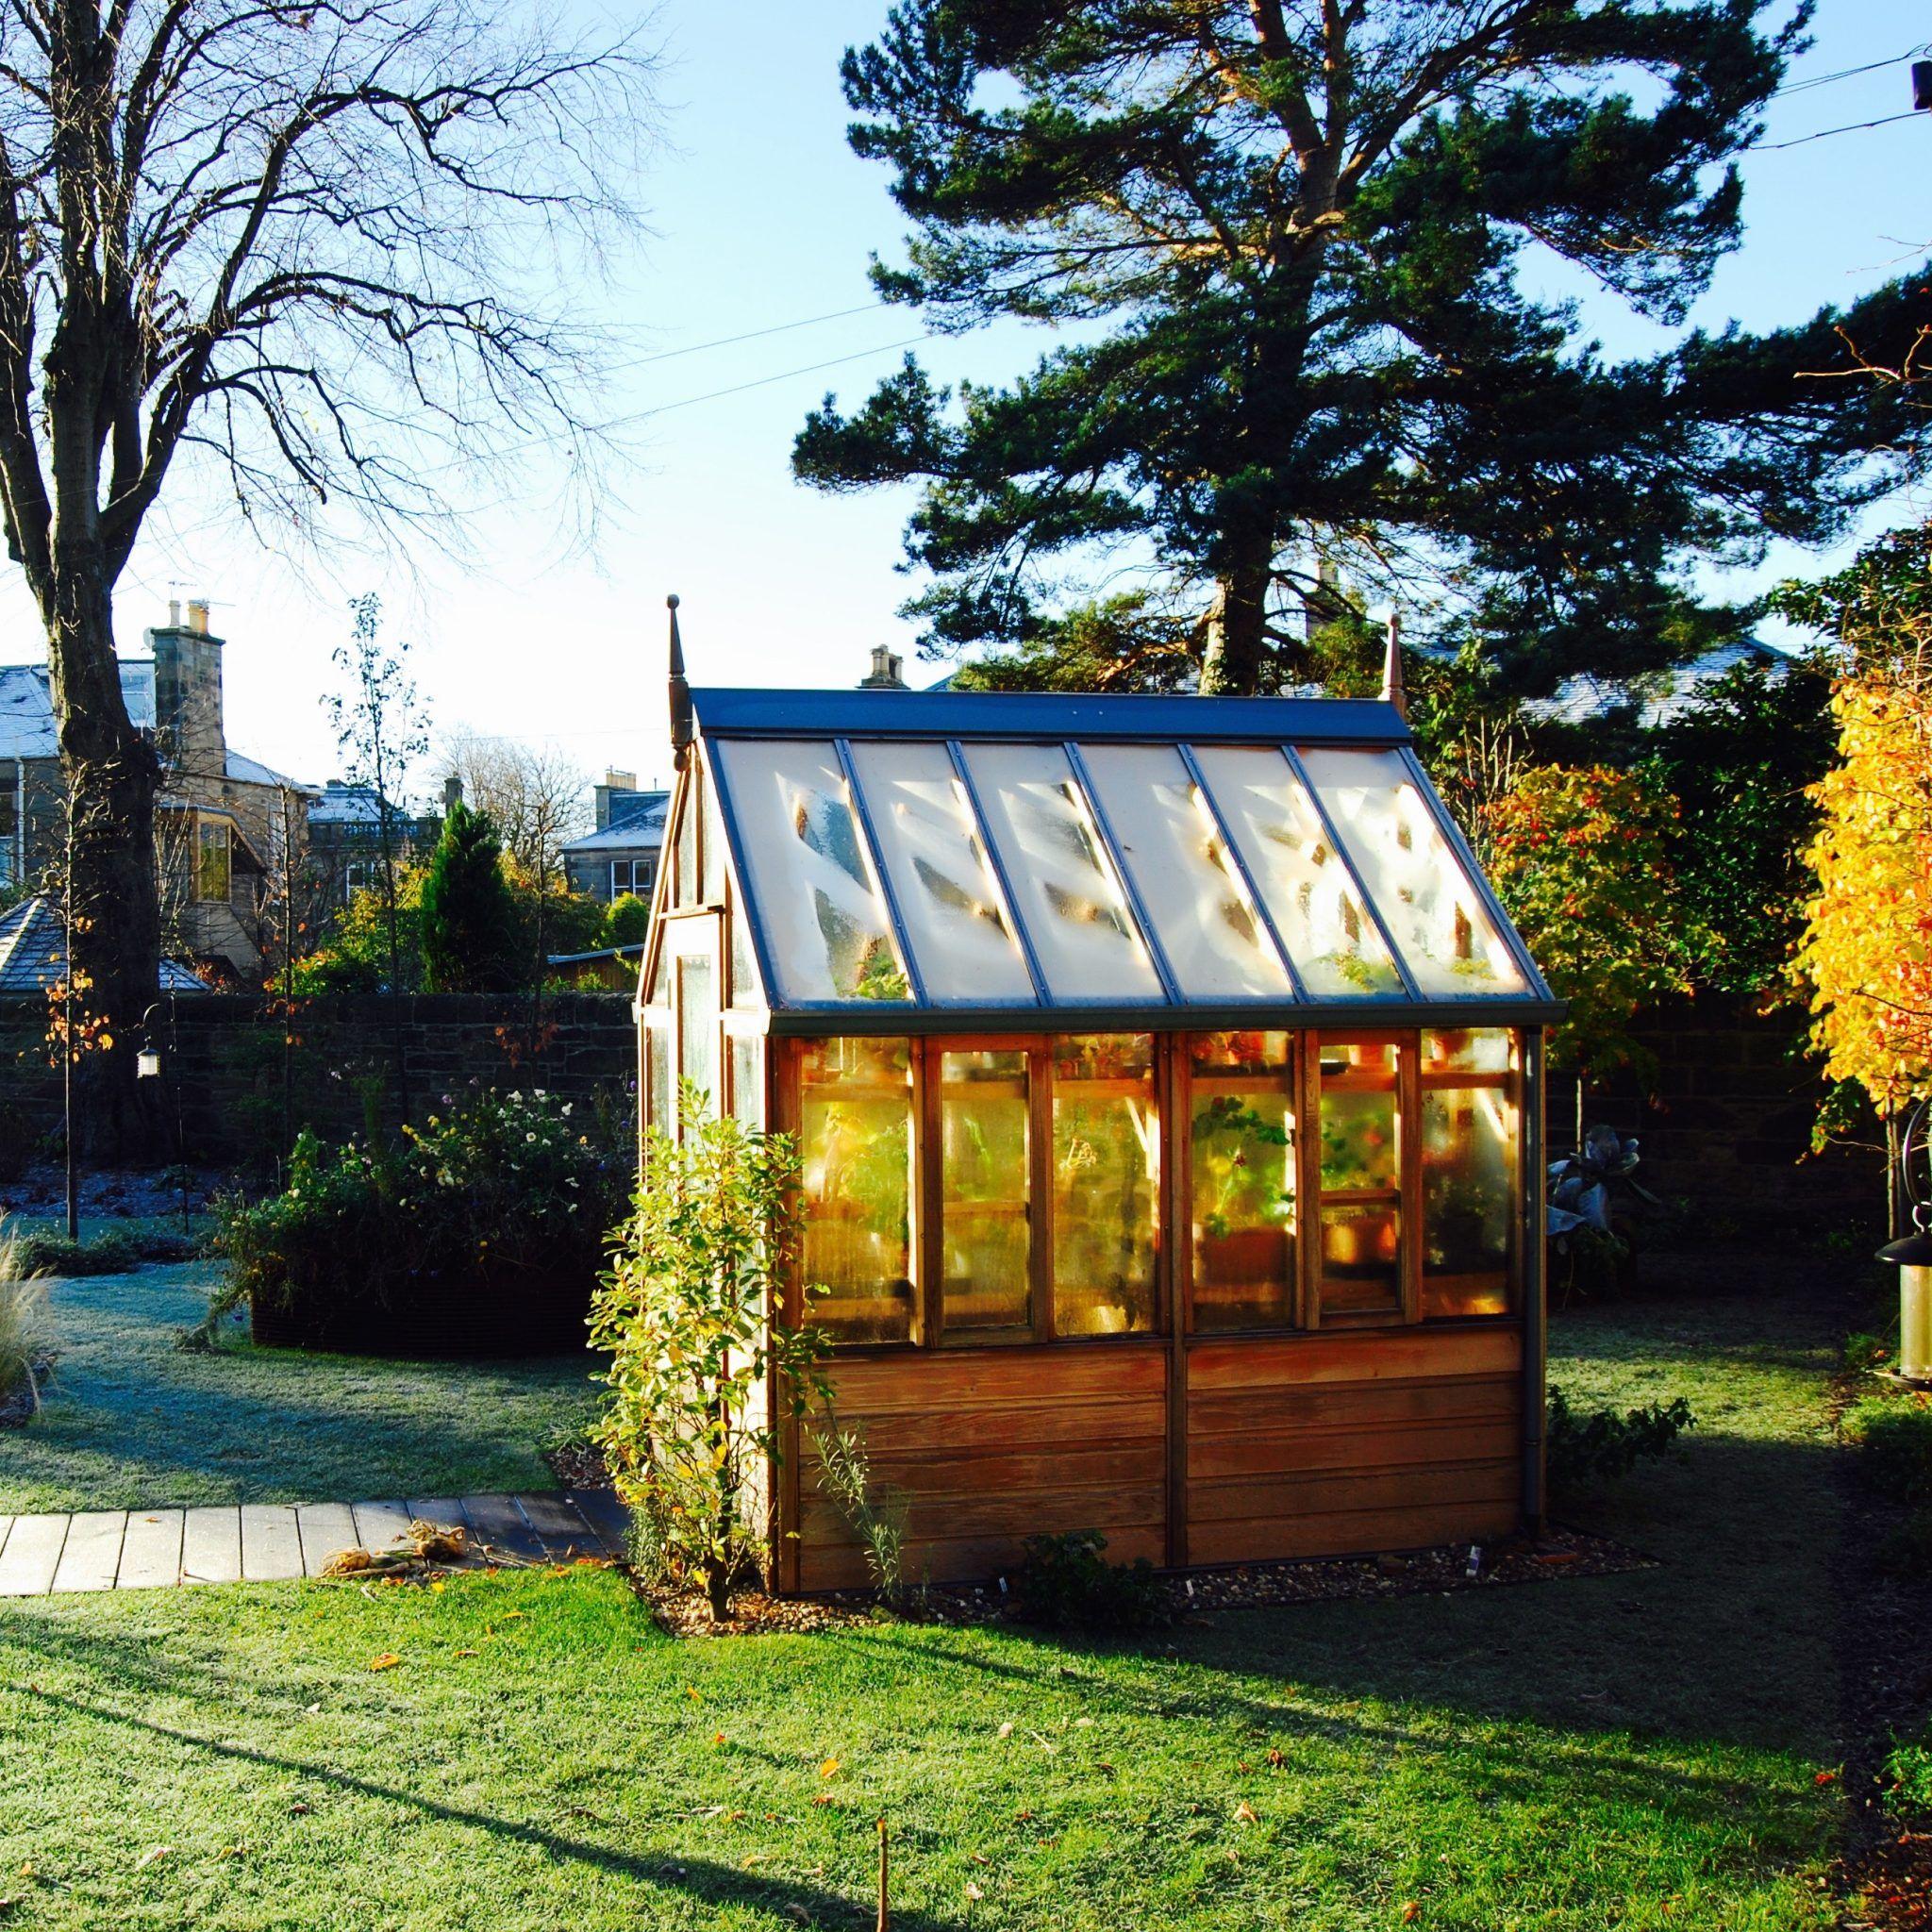 pin ash grohmann garden gardening greenhouse carolyn designed gabriel by frosted